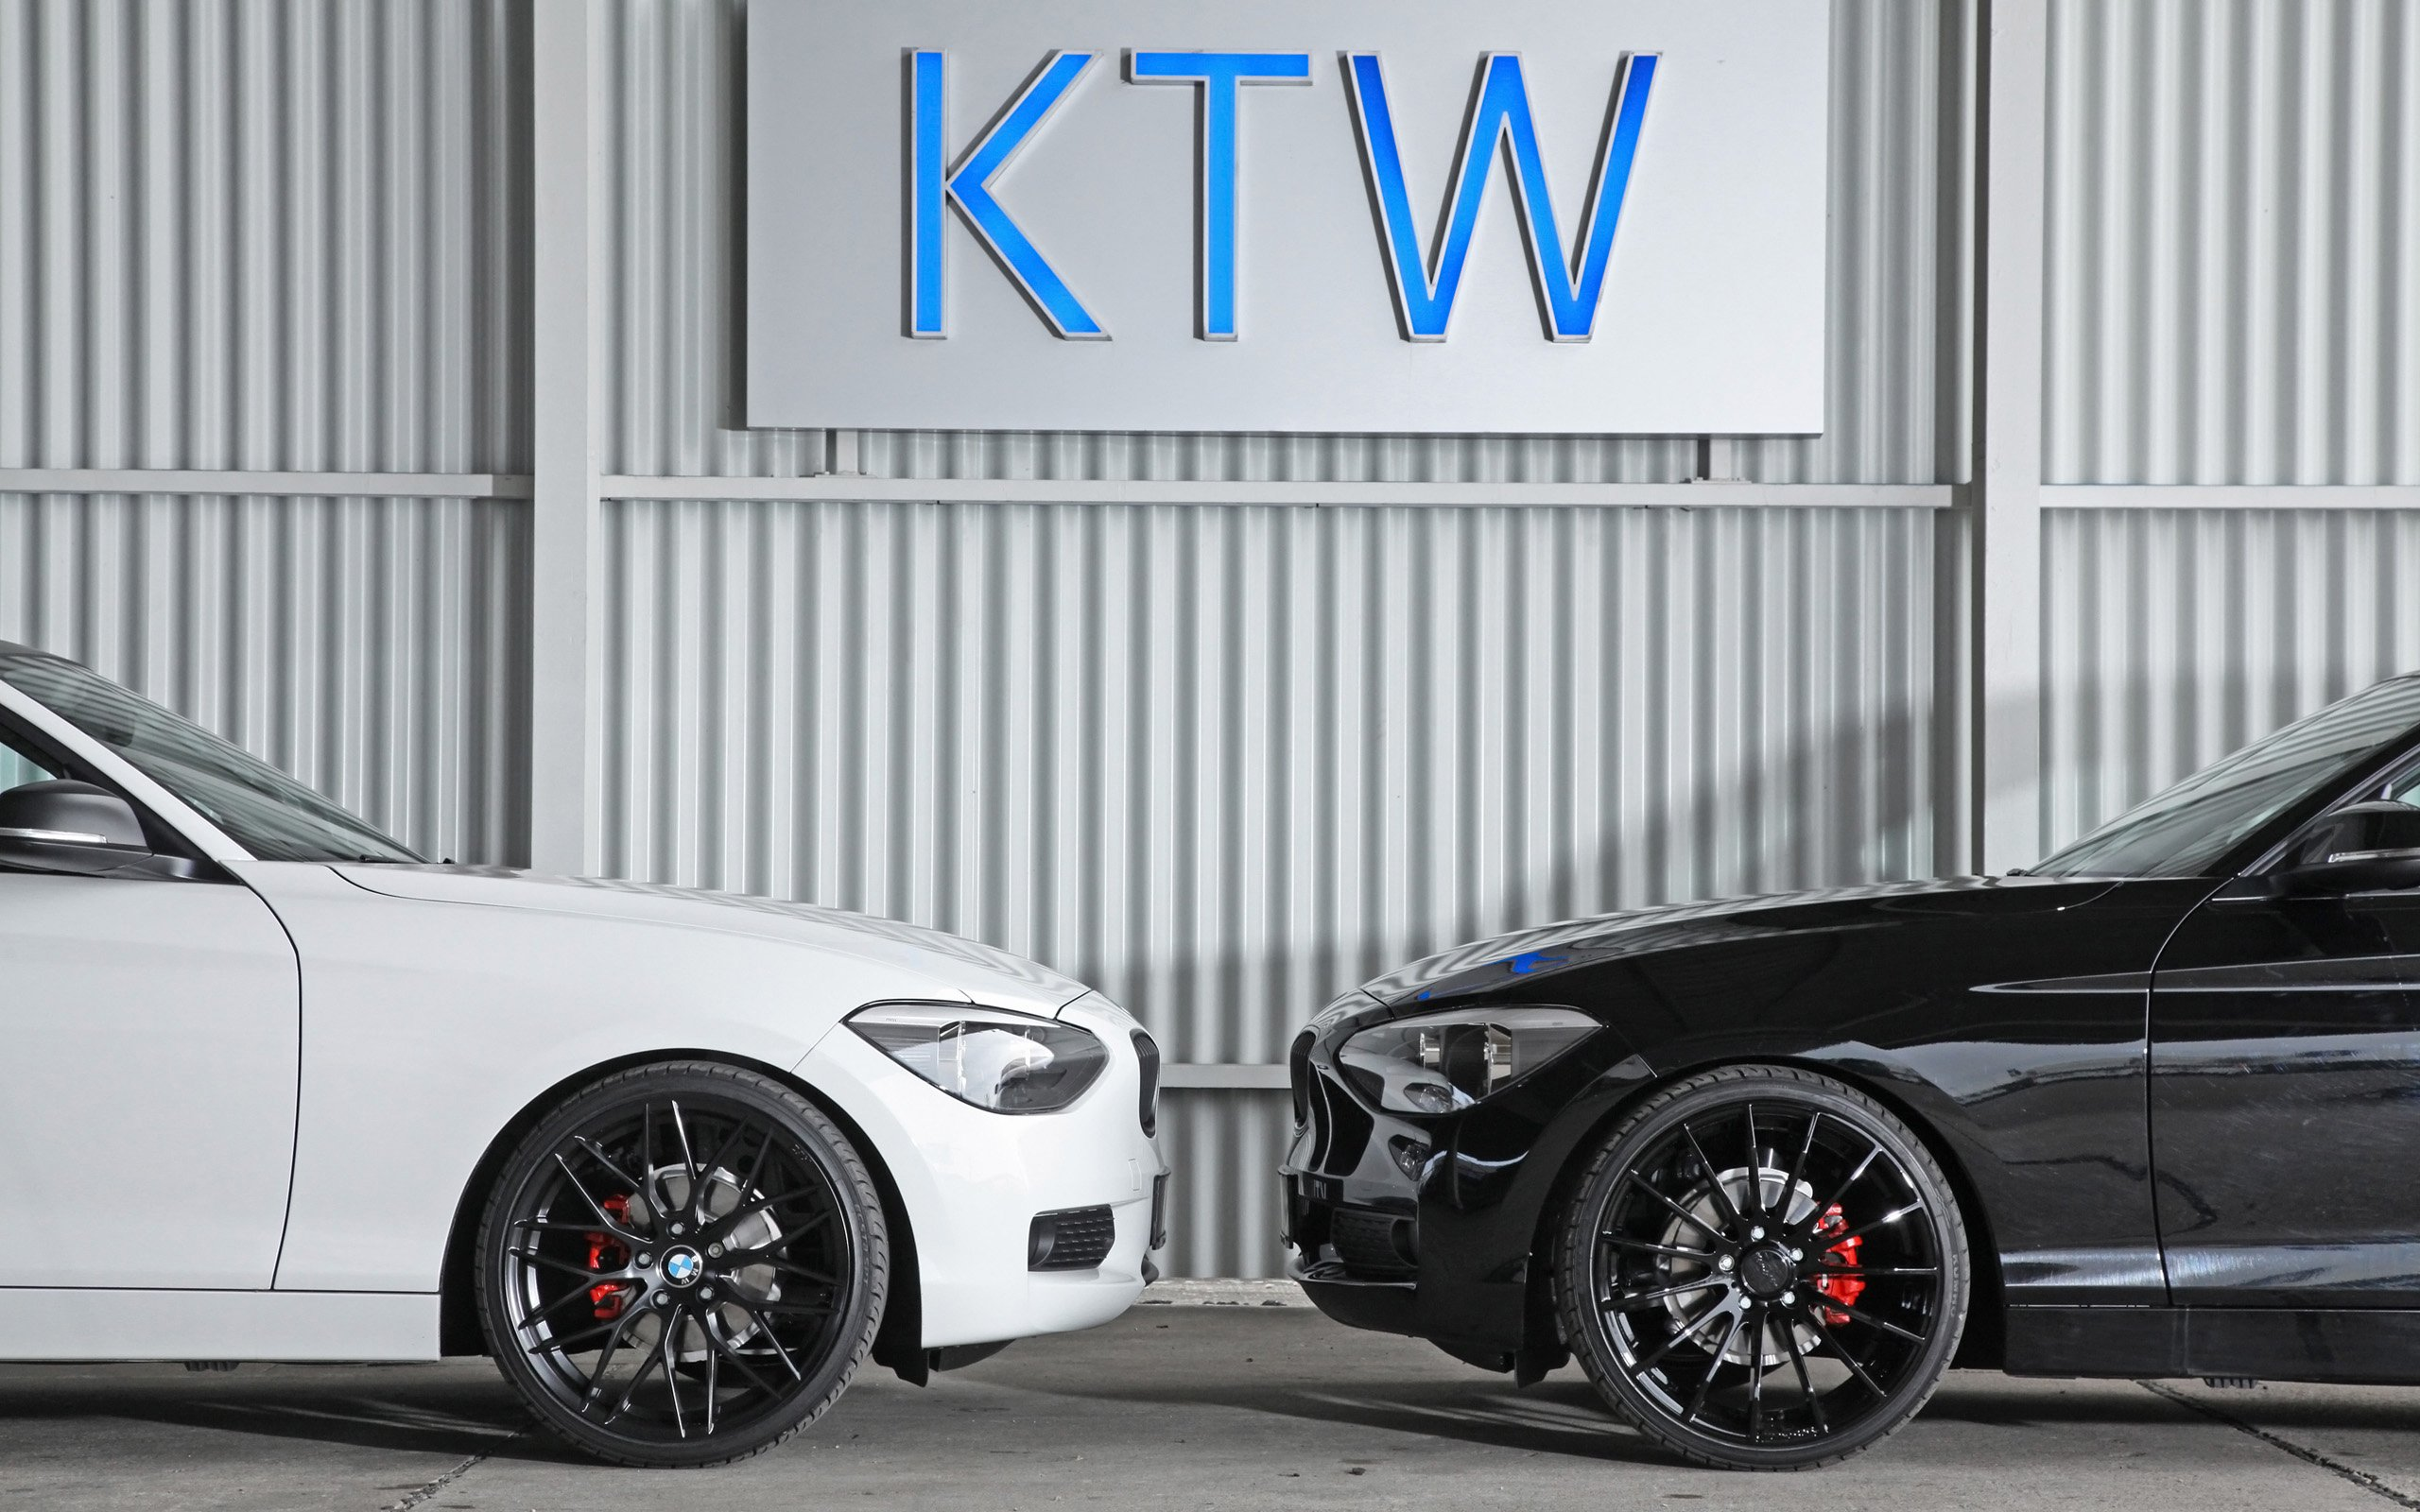 2014_KTW_Tuning_BMW_1_Series_tuning_wheel_____h_2560x1600.jpg